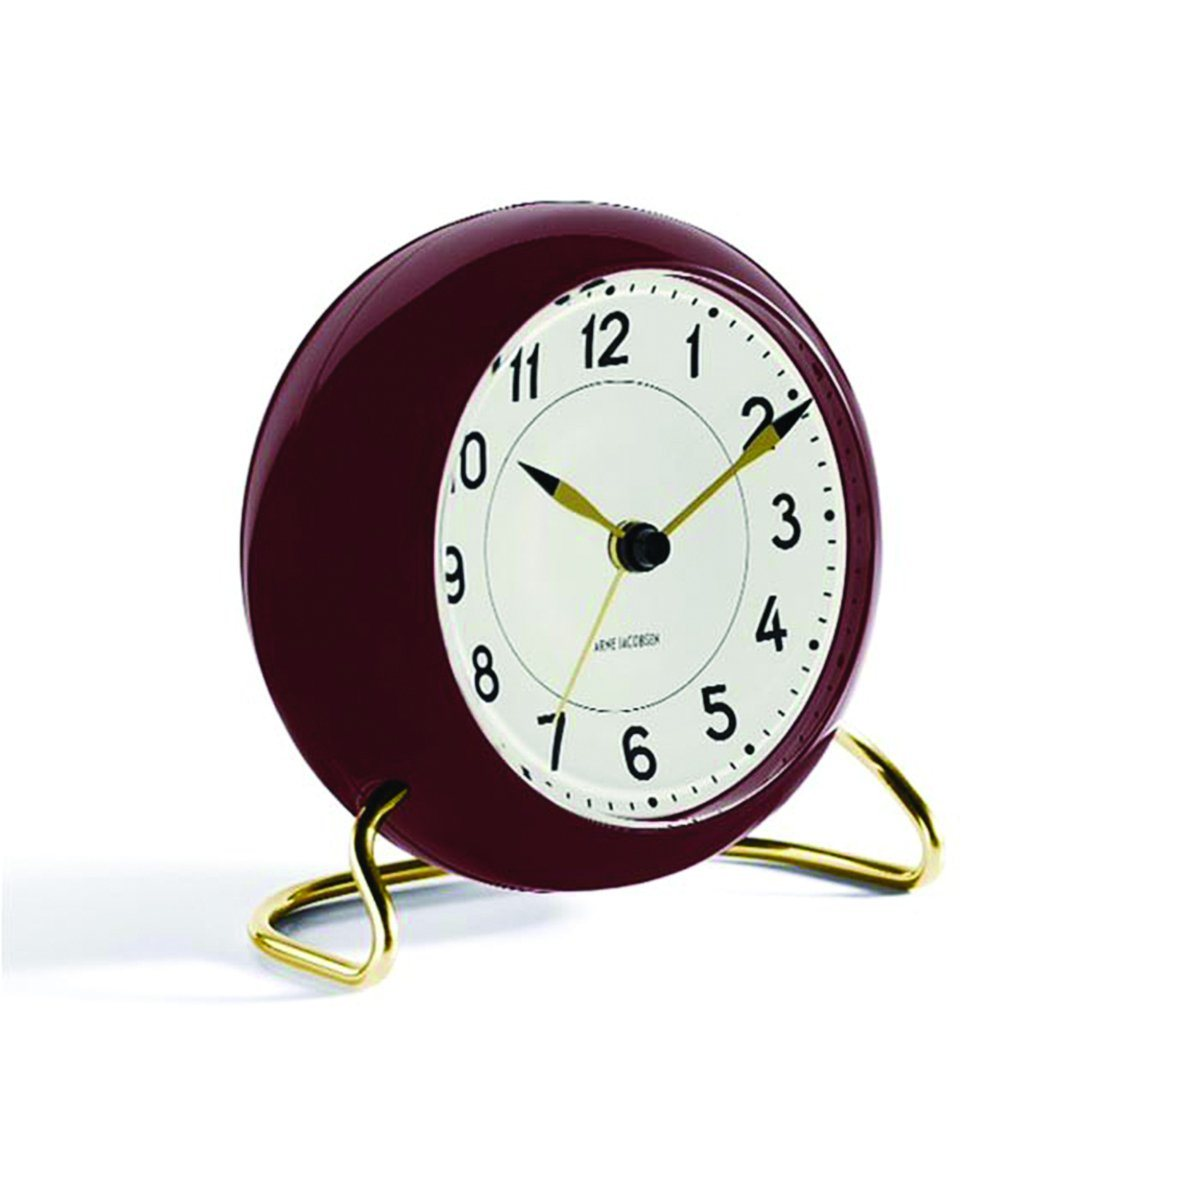 Rosendahl Arne Jacobsen Tischuhr Clock Station mit Alarm rotbraun gold | Dekoration > Uhren > Standuhren | Rotbraun - Gold | Glas - Abs - Gehärtetes - Kunststoff | Rosendahl